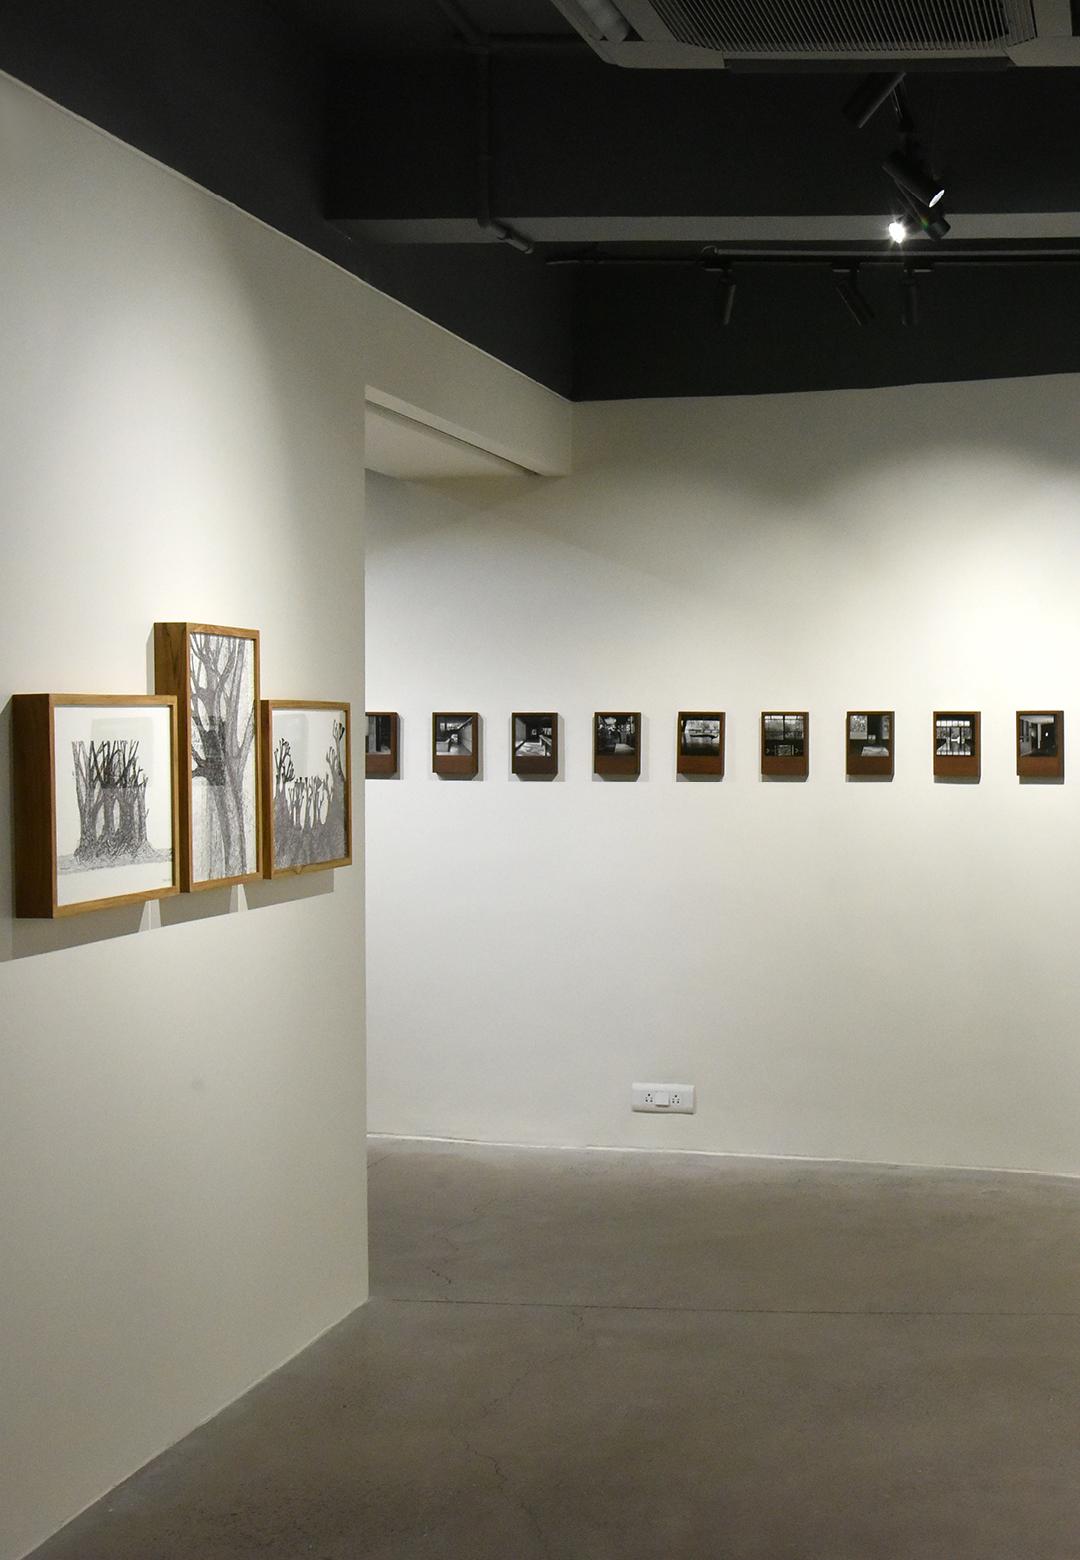 Installation view at India Art Fair 2019|BV Box| Balkrishna Doshi| Lida Shihoko| STIR